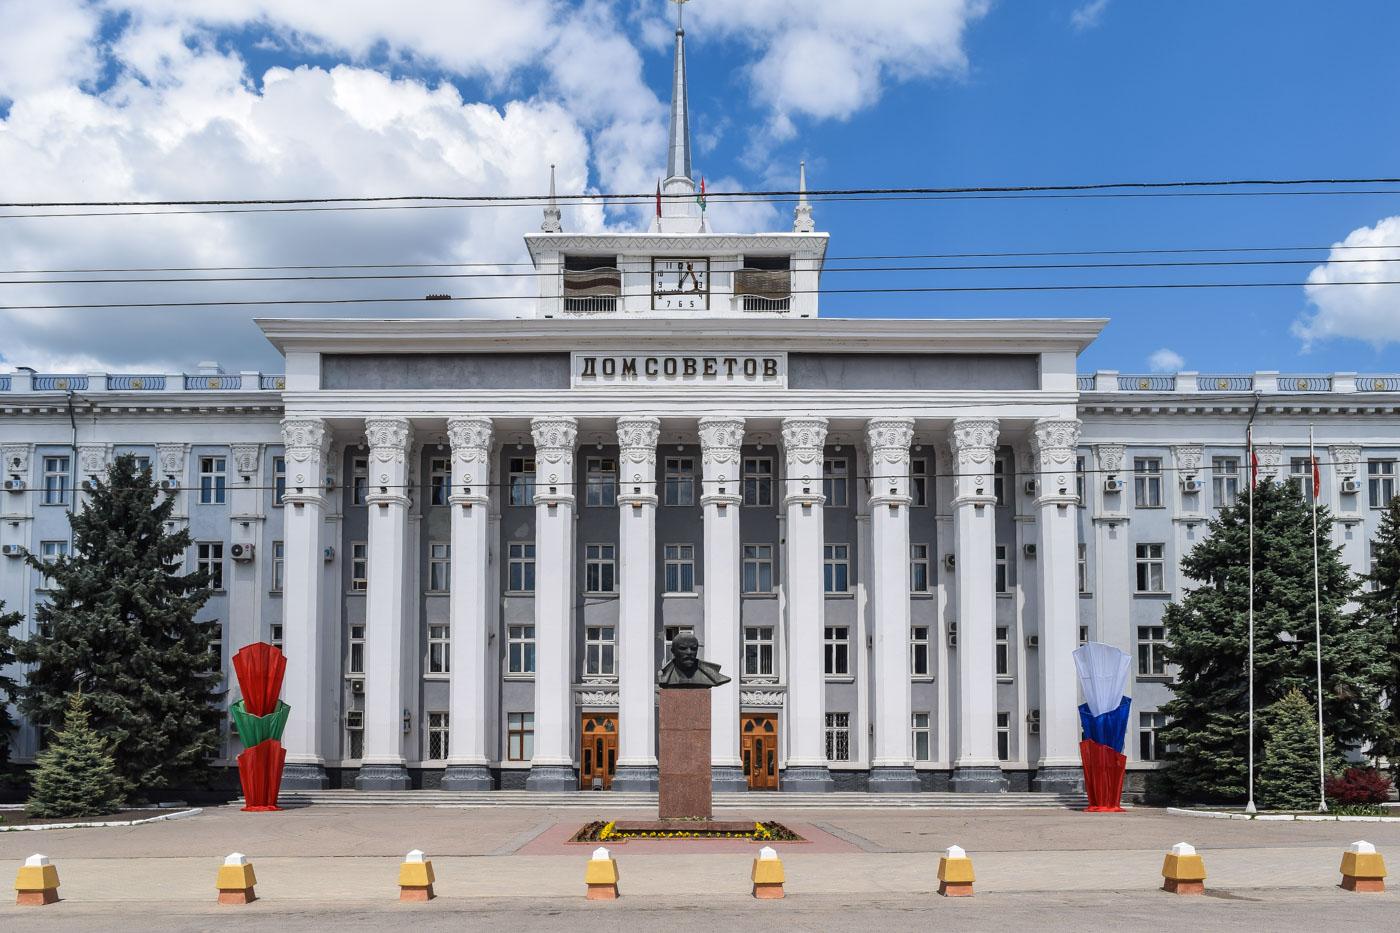 Велопутешестиве по Молдове, Приднестровье